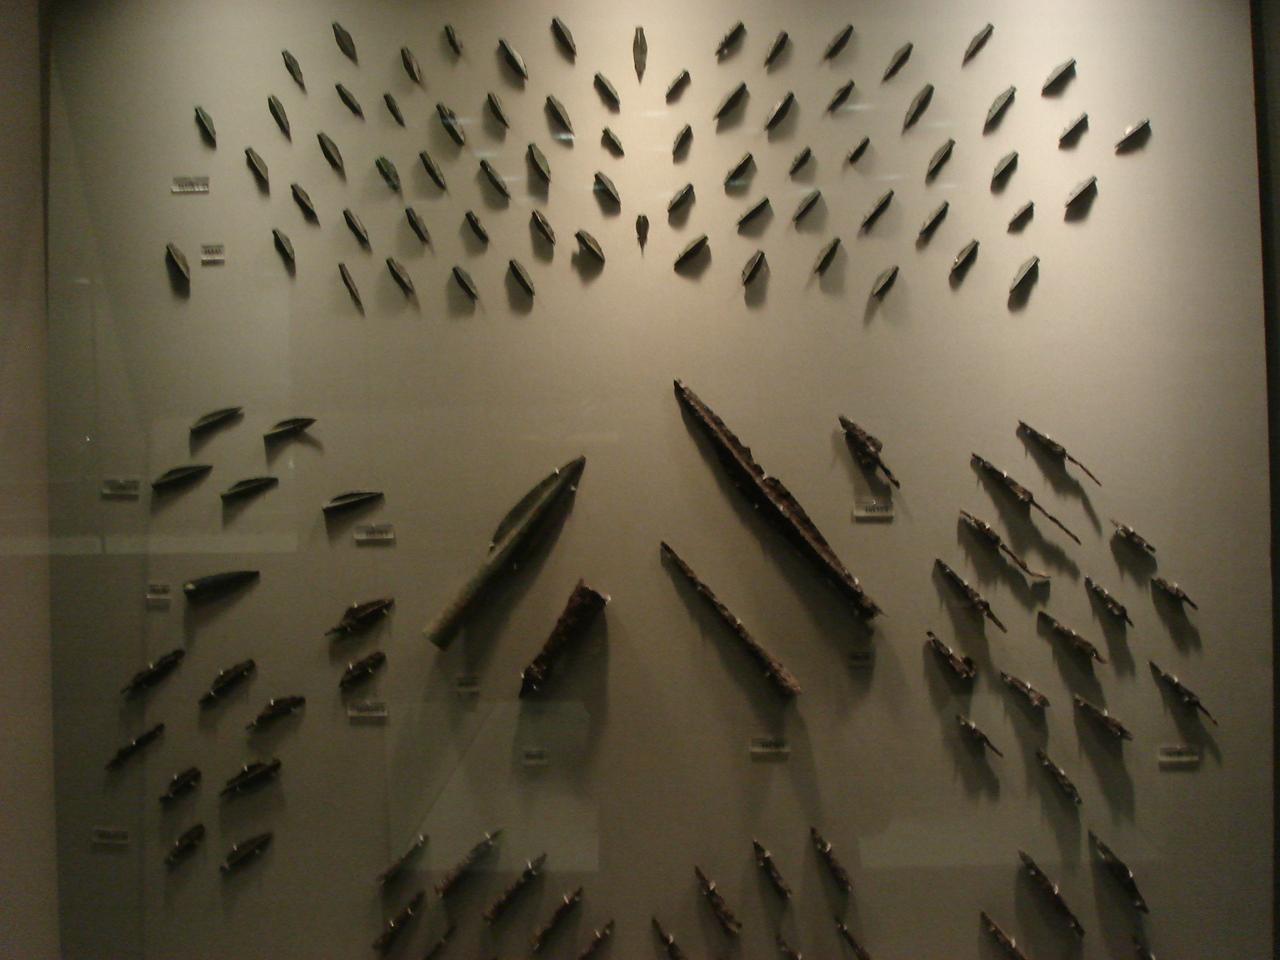 Sharp Piercing Objects London Fencing Club